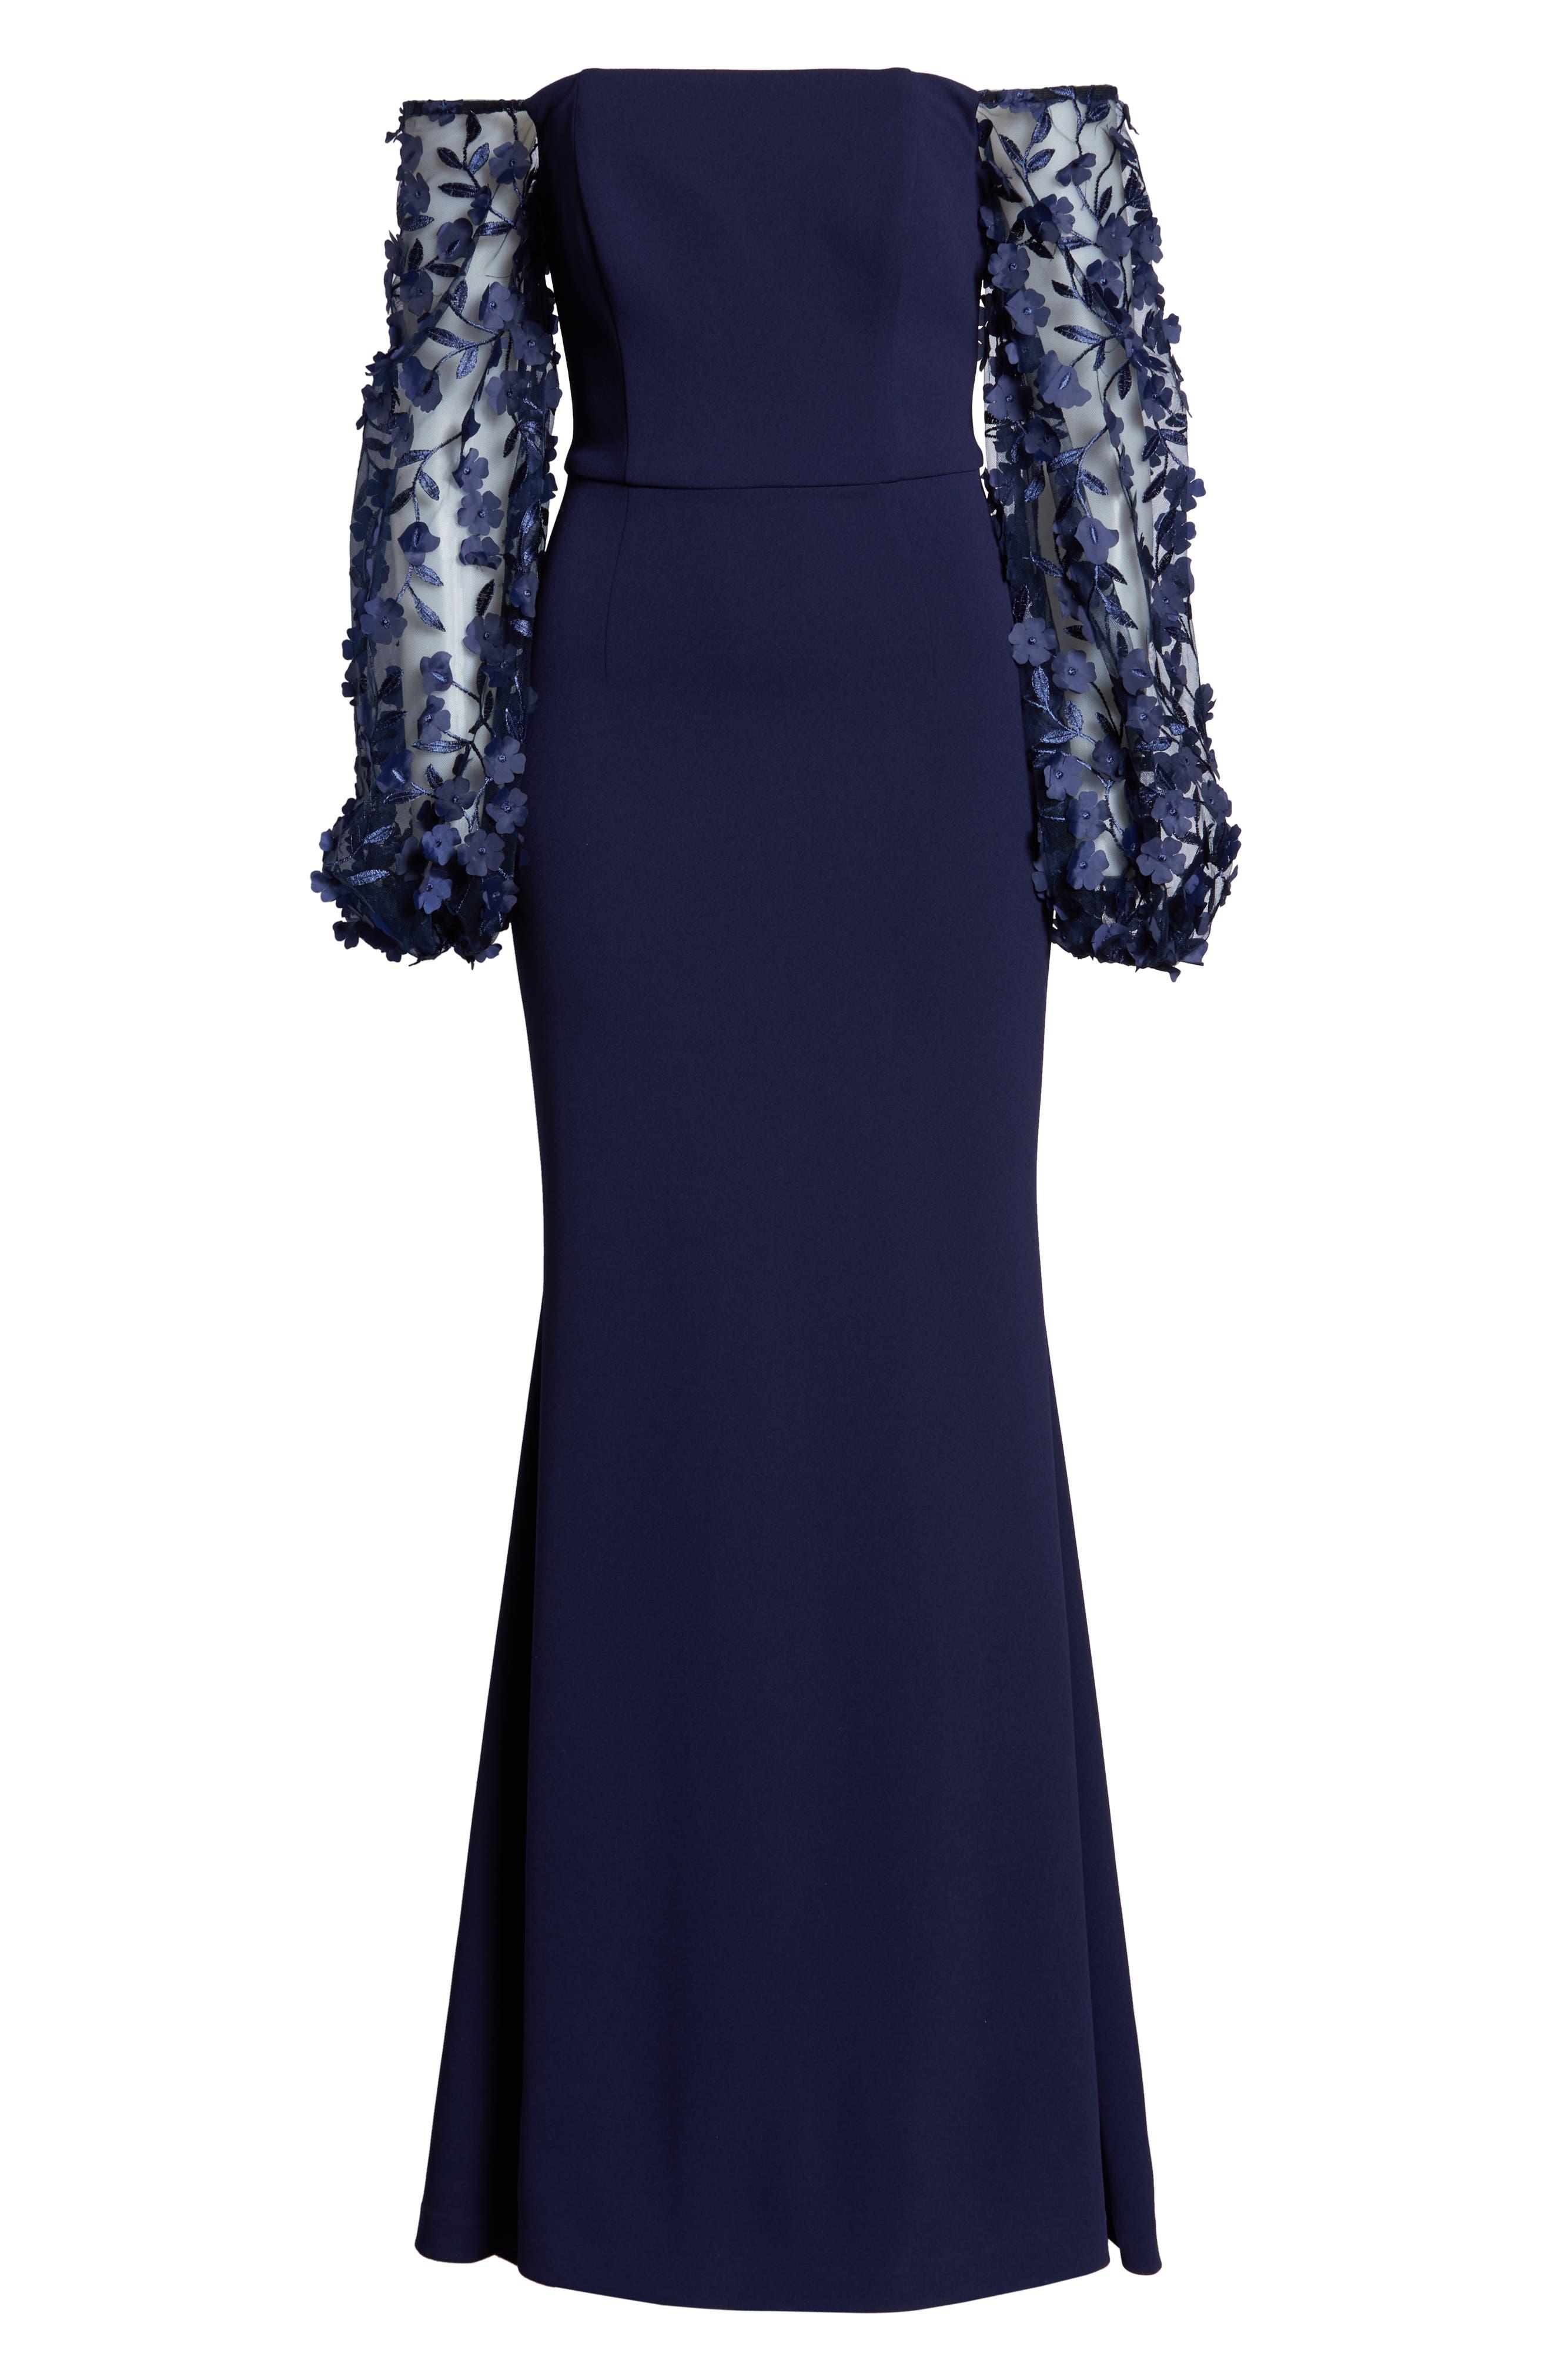 ELIZA J,                             Off the Shoulder 3D Floral Sleeve Scuba Crepe Evening Dress,                             Alternate thumbnail 7, color,                             NAVY